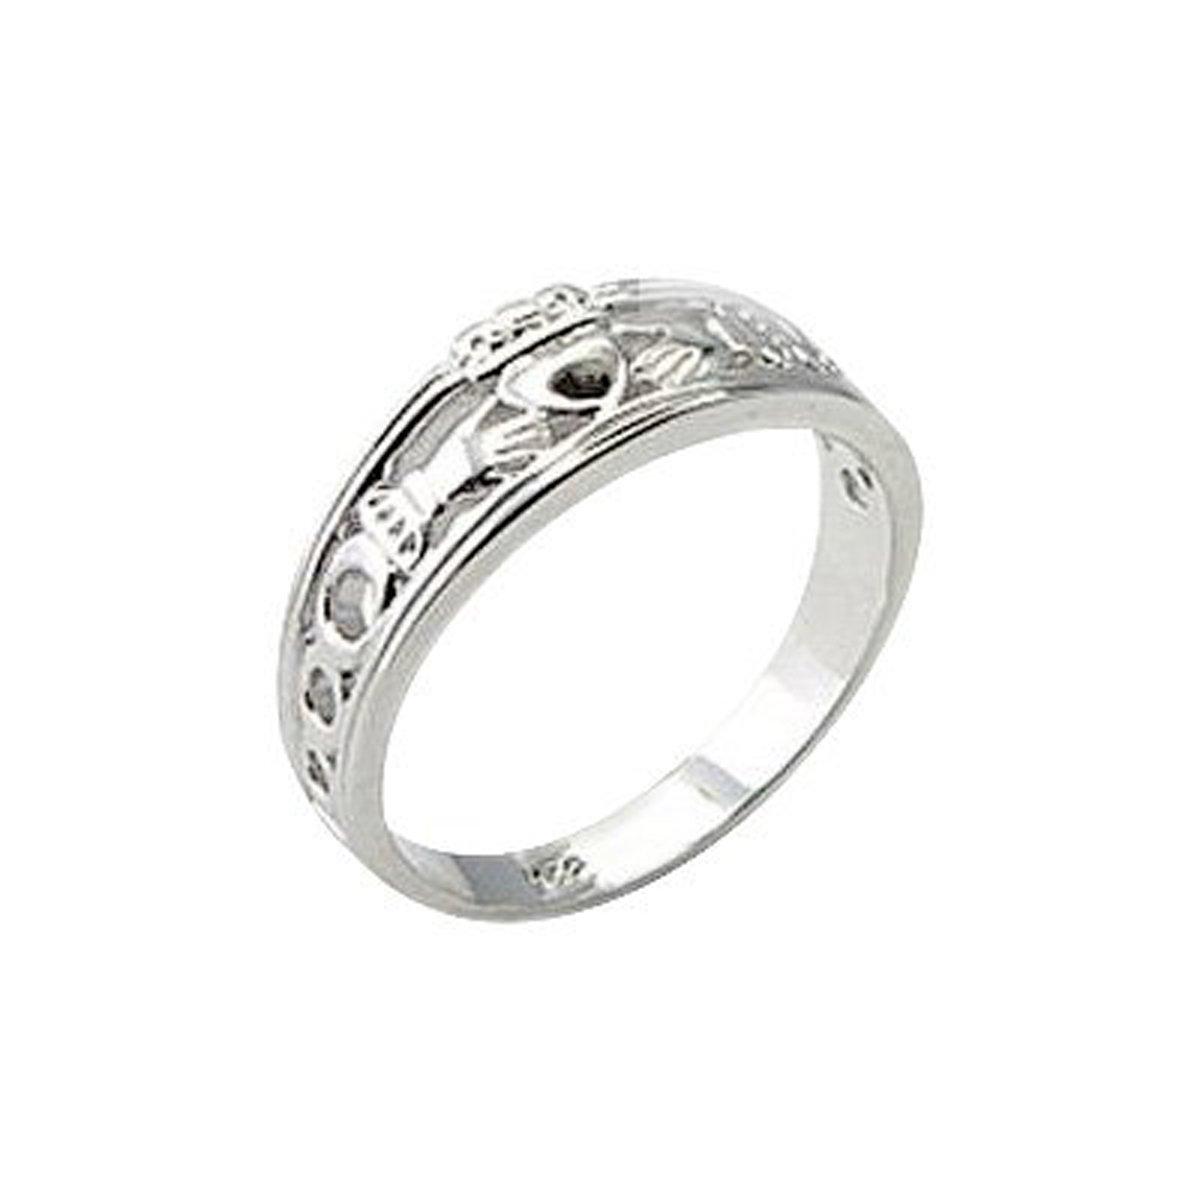 Bague, argent sterling, Claddagh irlandais (poids: 3,3g) HYPM Jewellery SSR-019